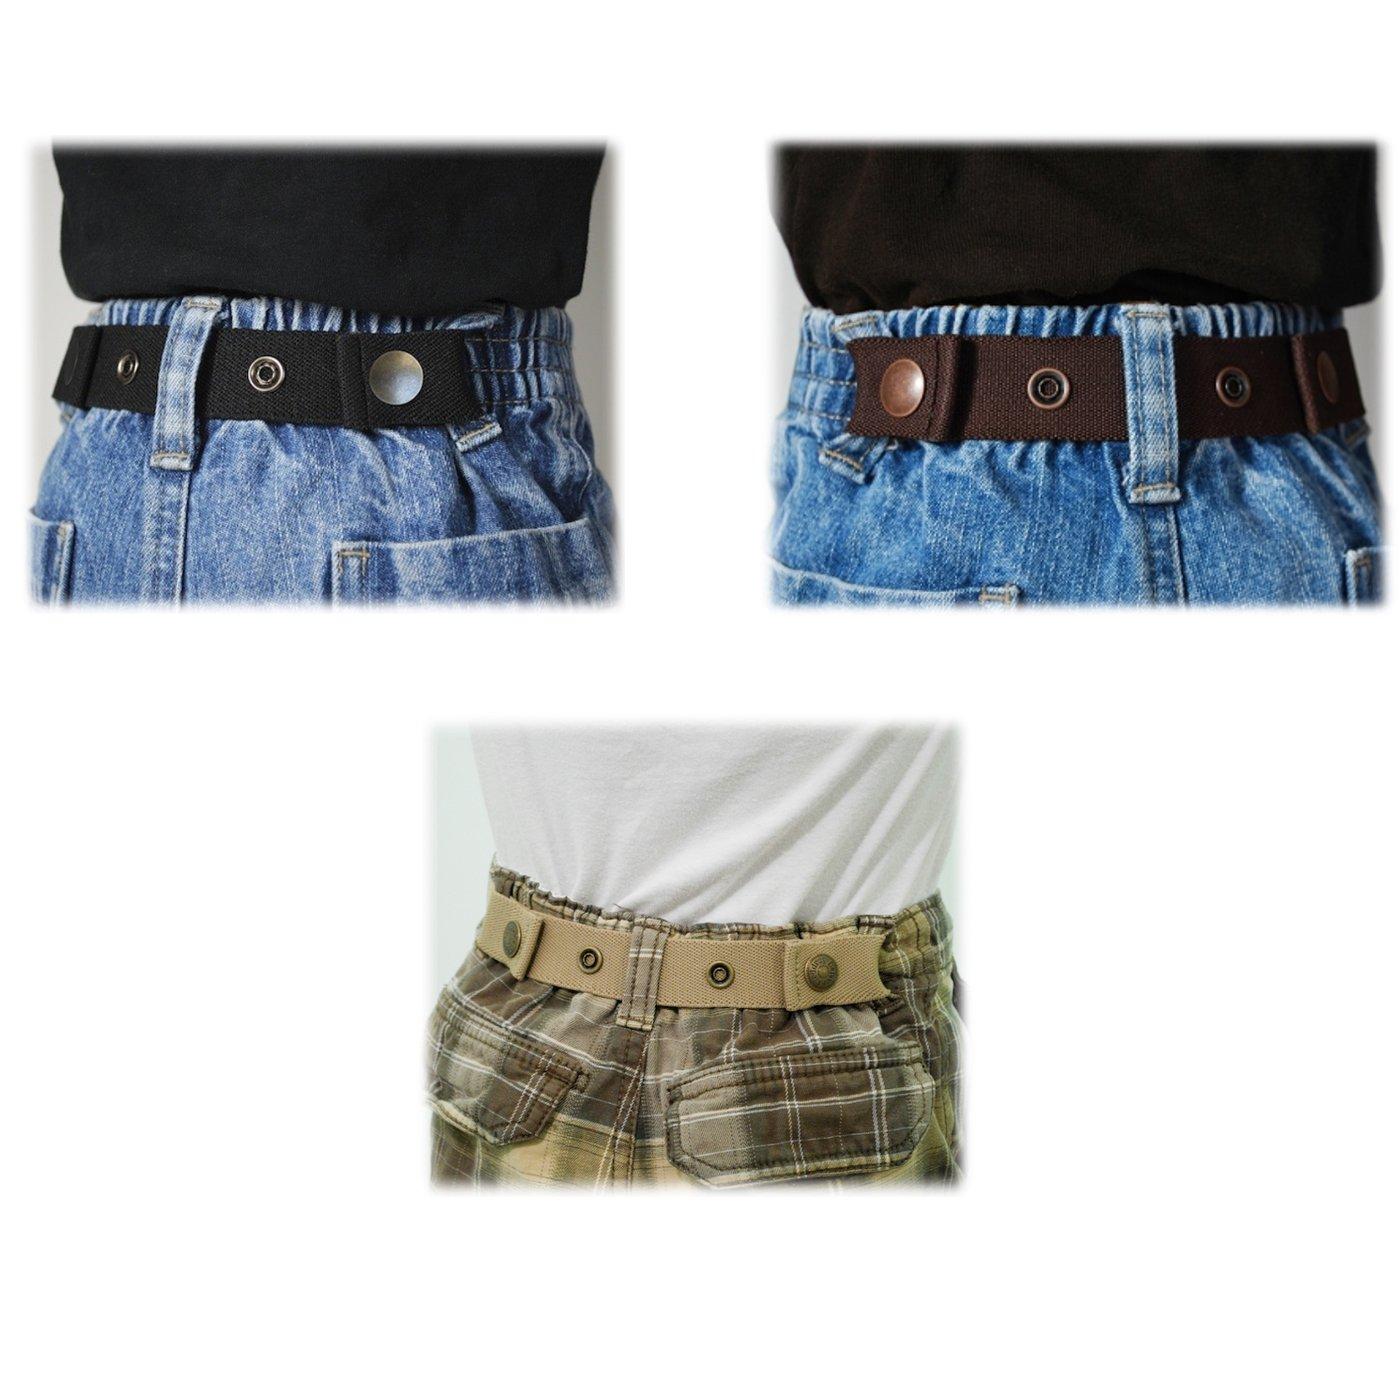 Dapper Snapper Baby & Toddler Adjustable Belt- Boys Colors: Black, Chocolate, and Beige